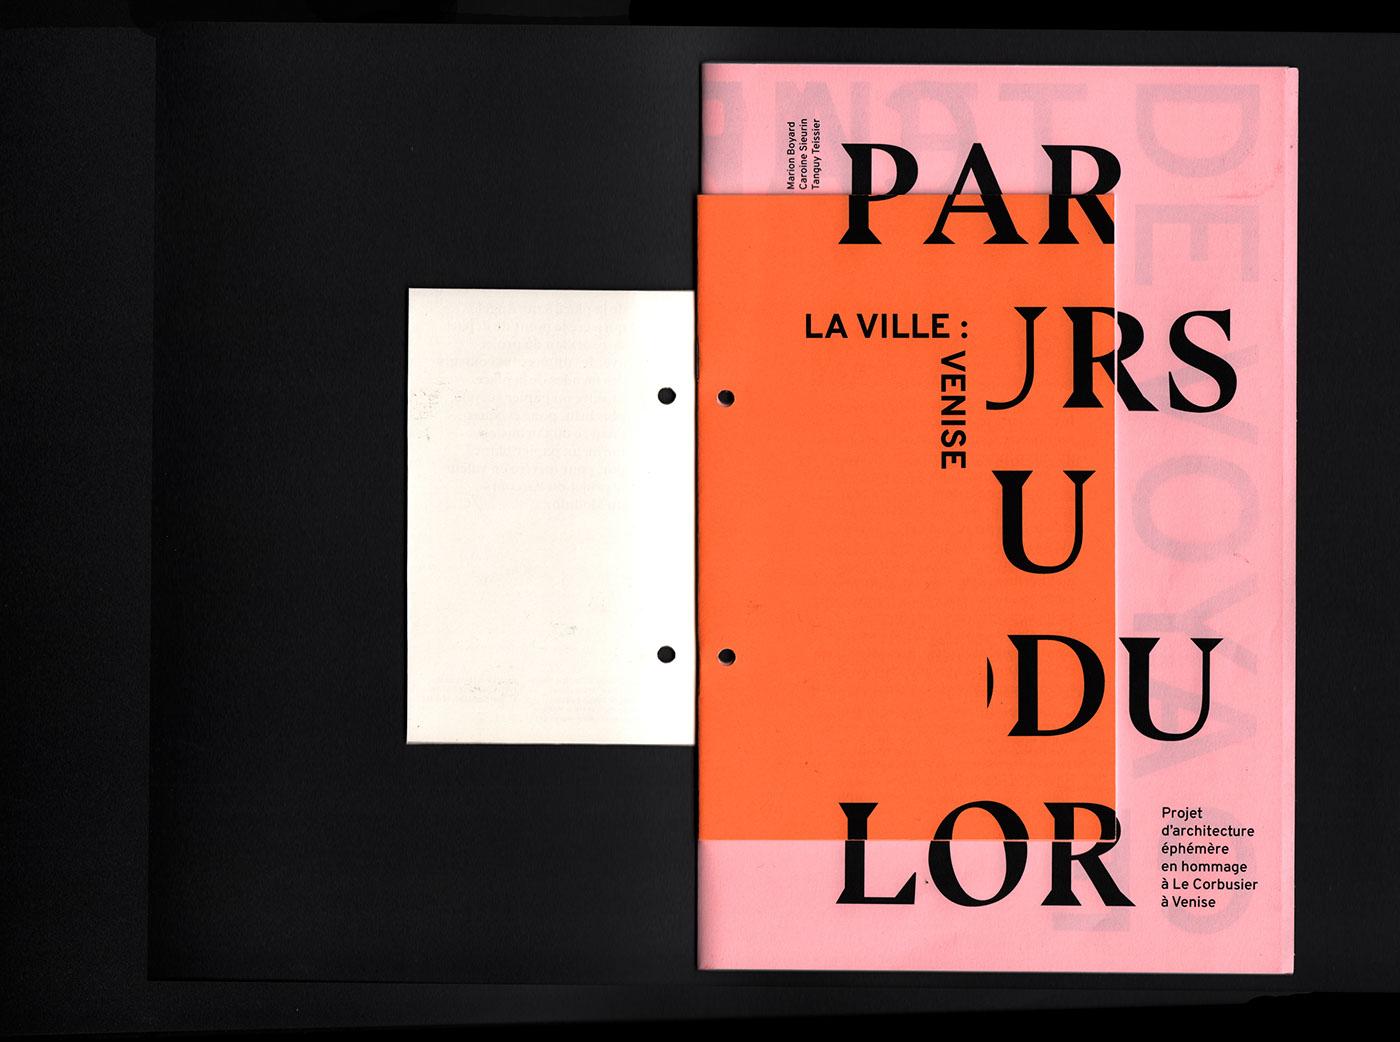 edition editorial design  book architecture Le Corbusier colours bluu next typography